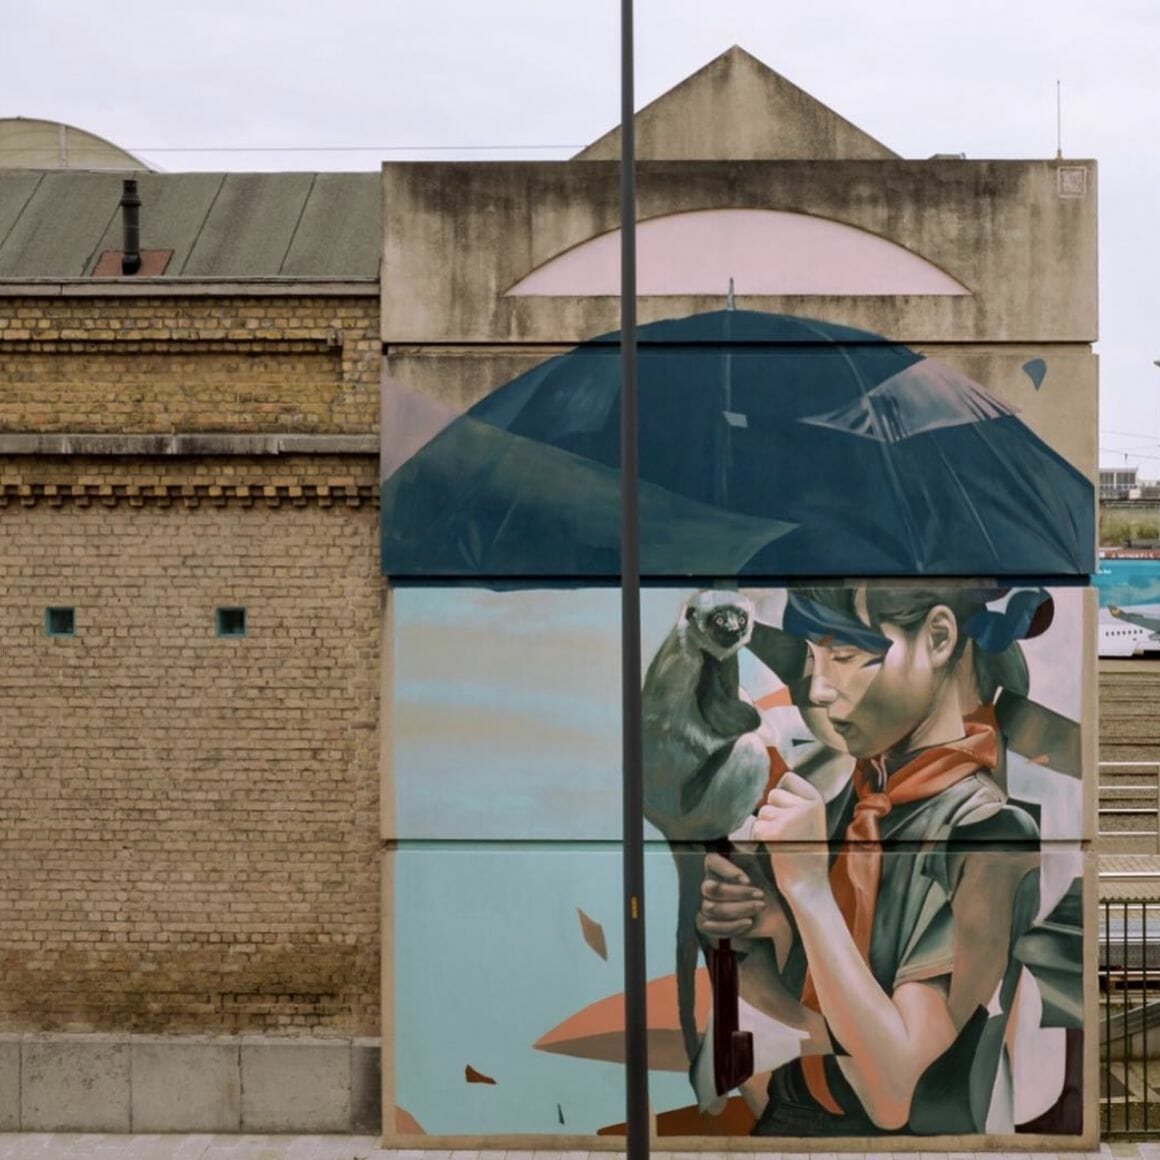 Peinture murale de du duo de street artistes Telmo Miel